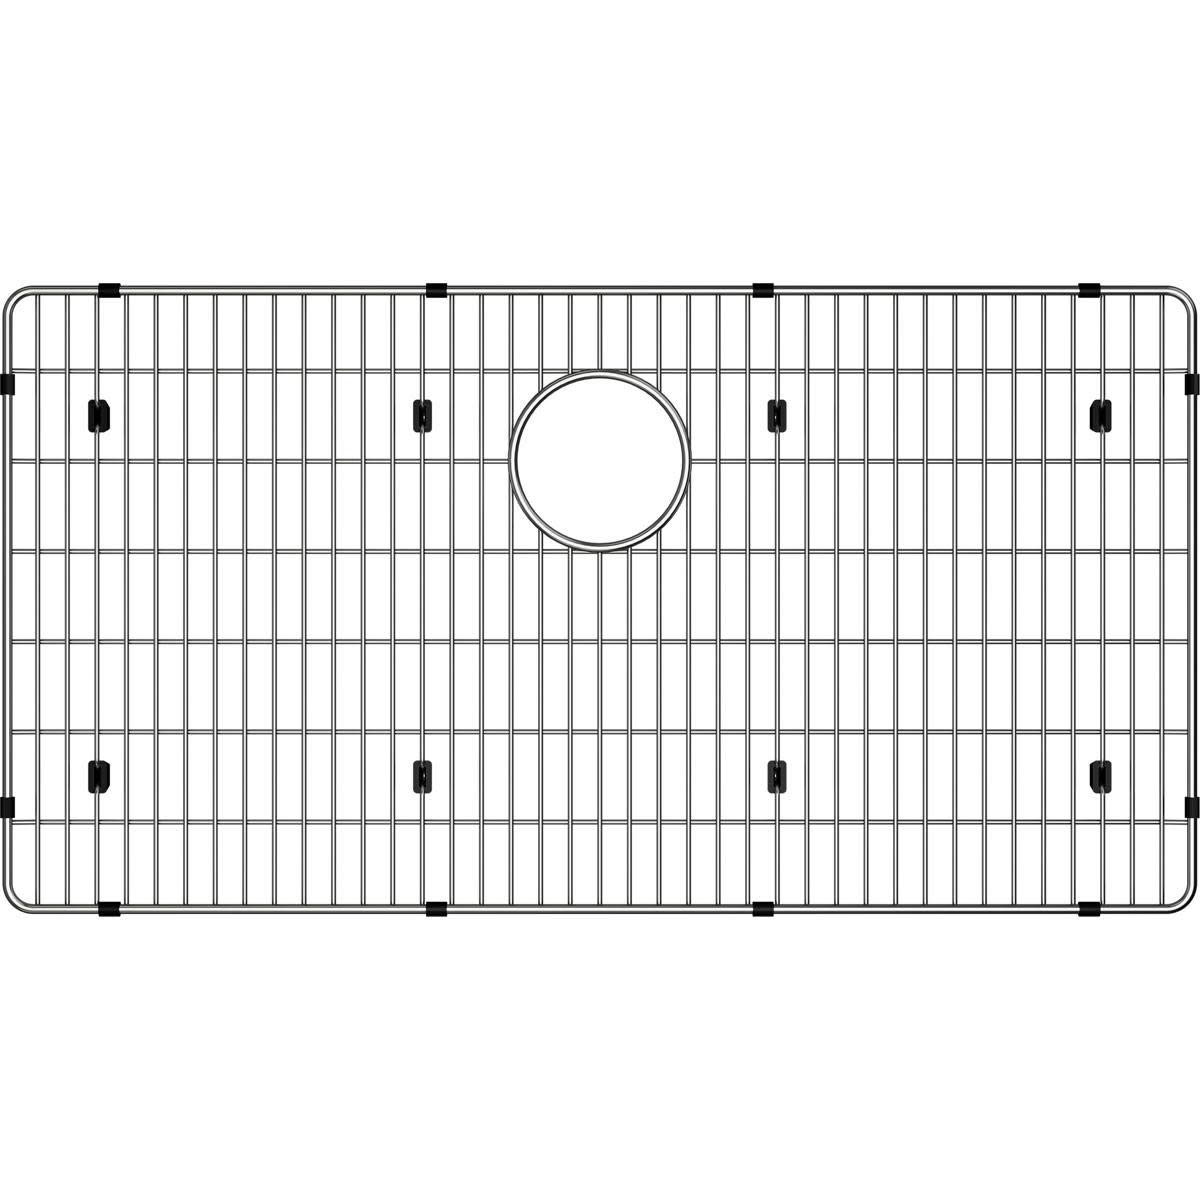 Elkay CTXBG2915 Crosstown 29'' L x 15-1/4'' W Stainless Steel Basin Rack